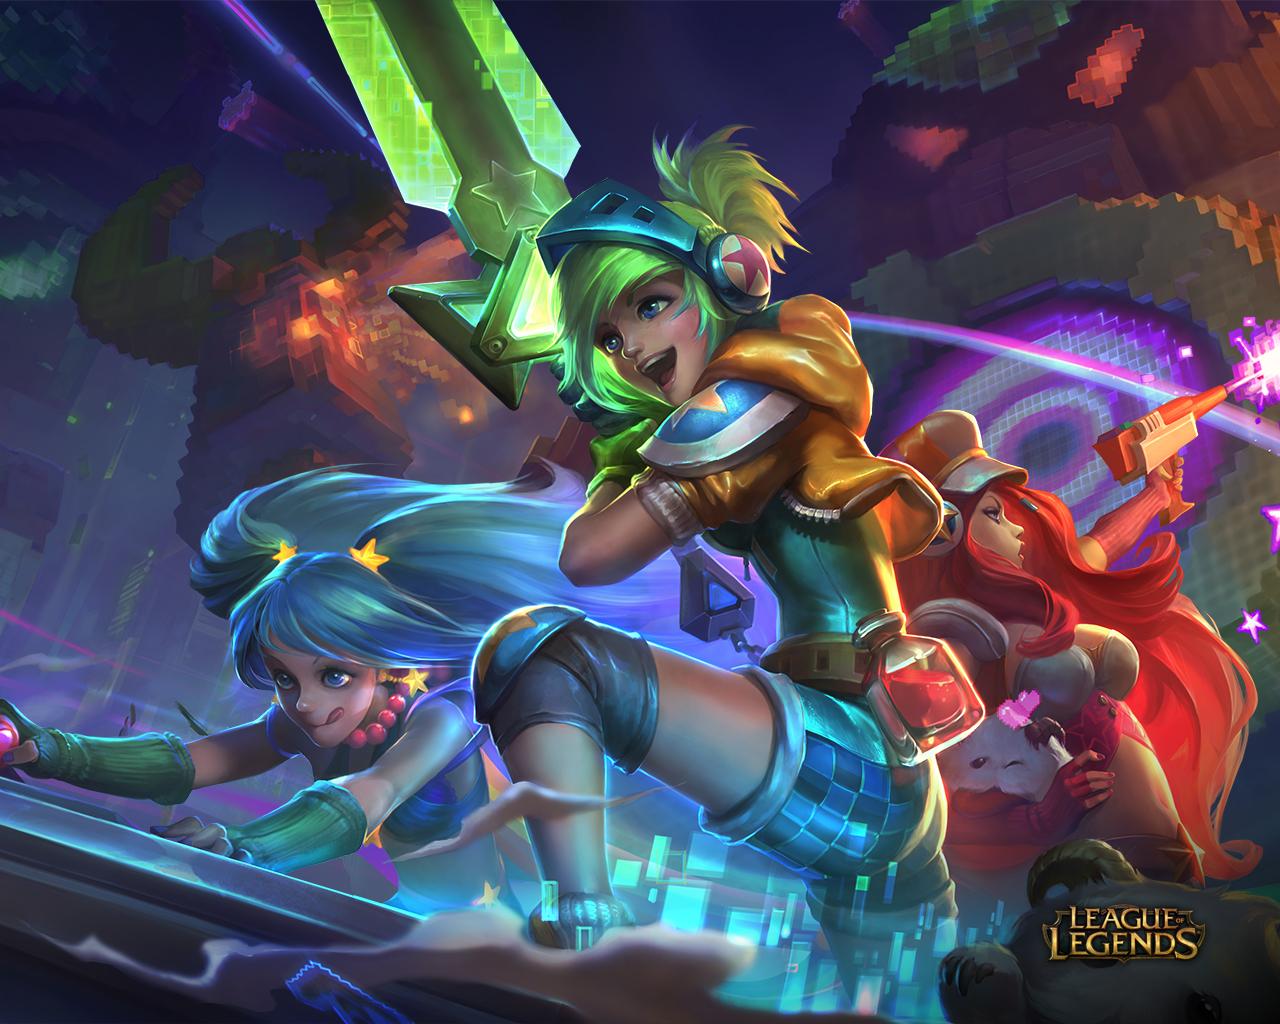 Arcade League Of Legends